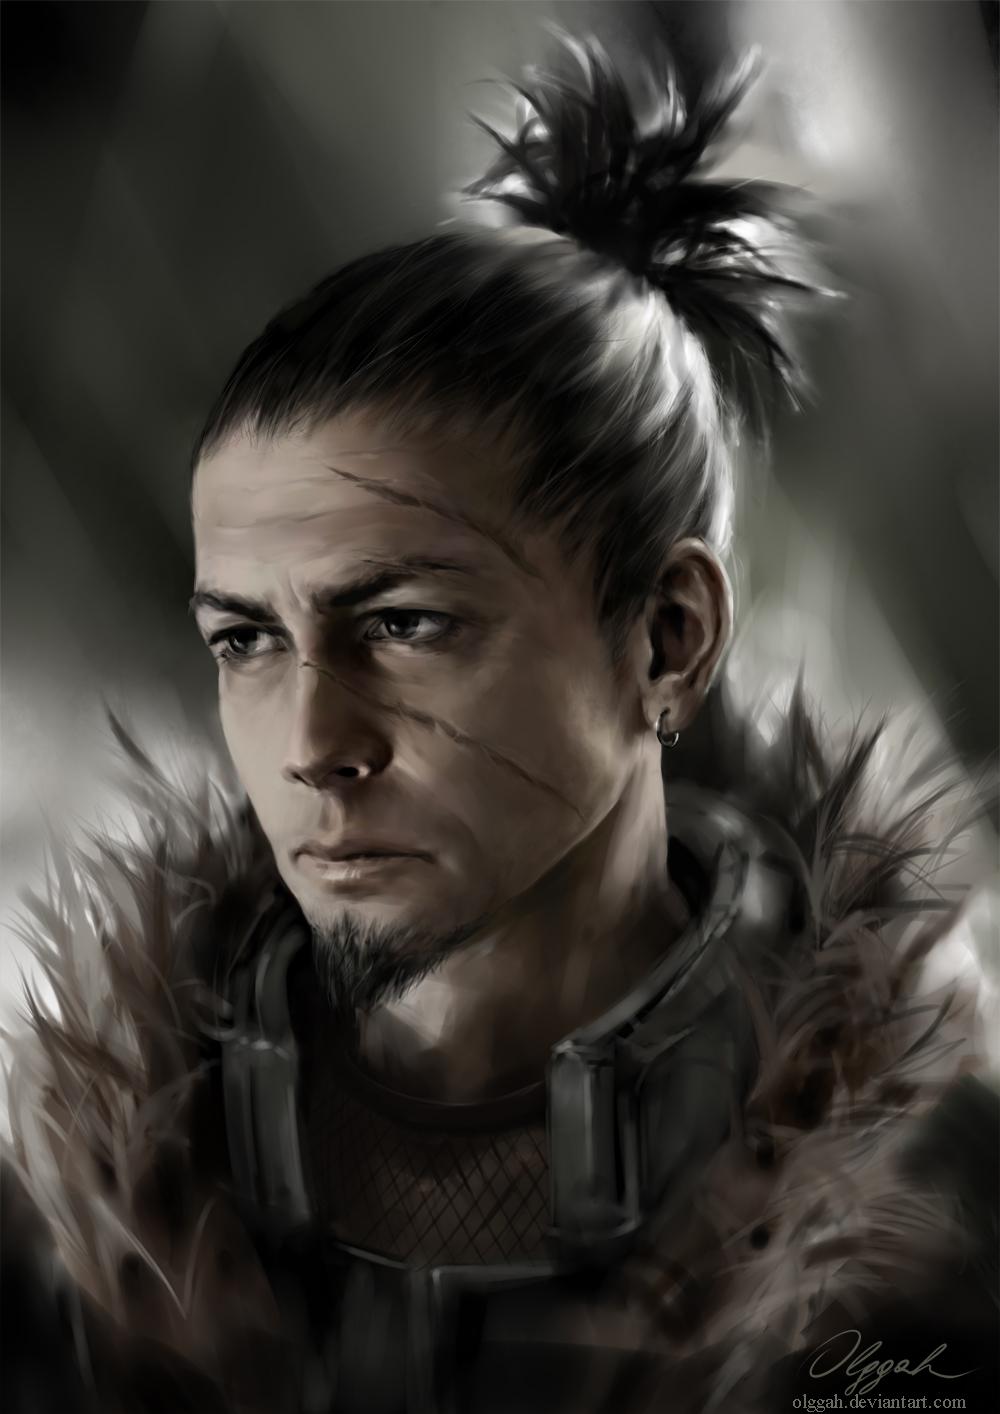 Naruto Fan Art by Olggah on DeviantArt